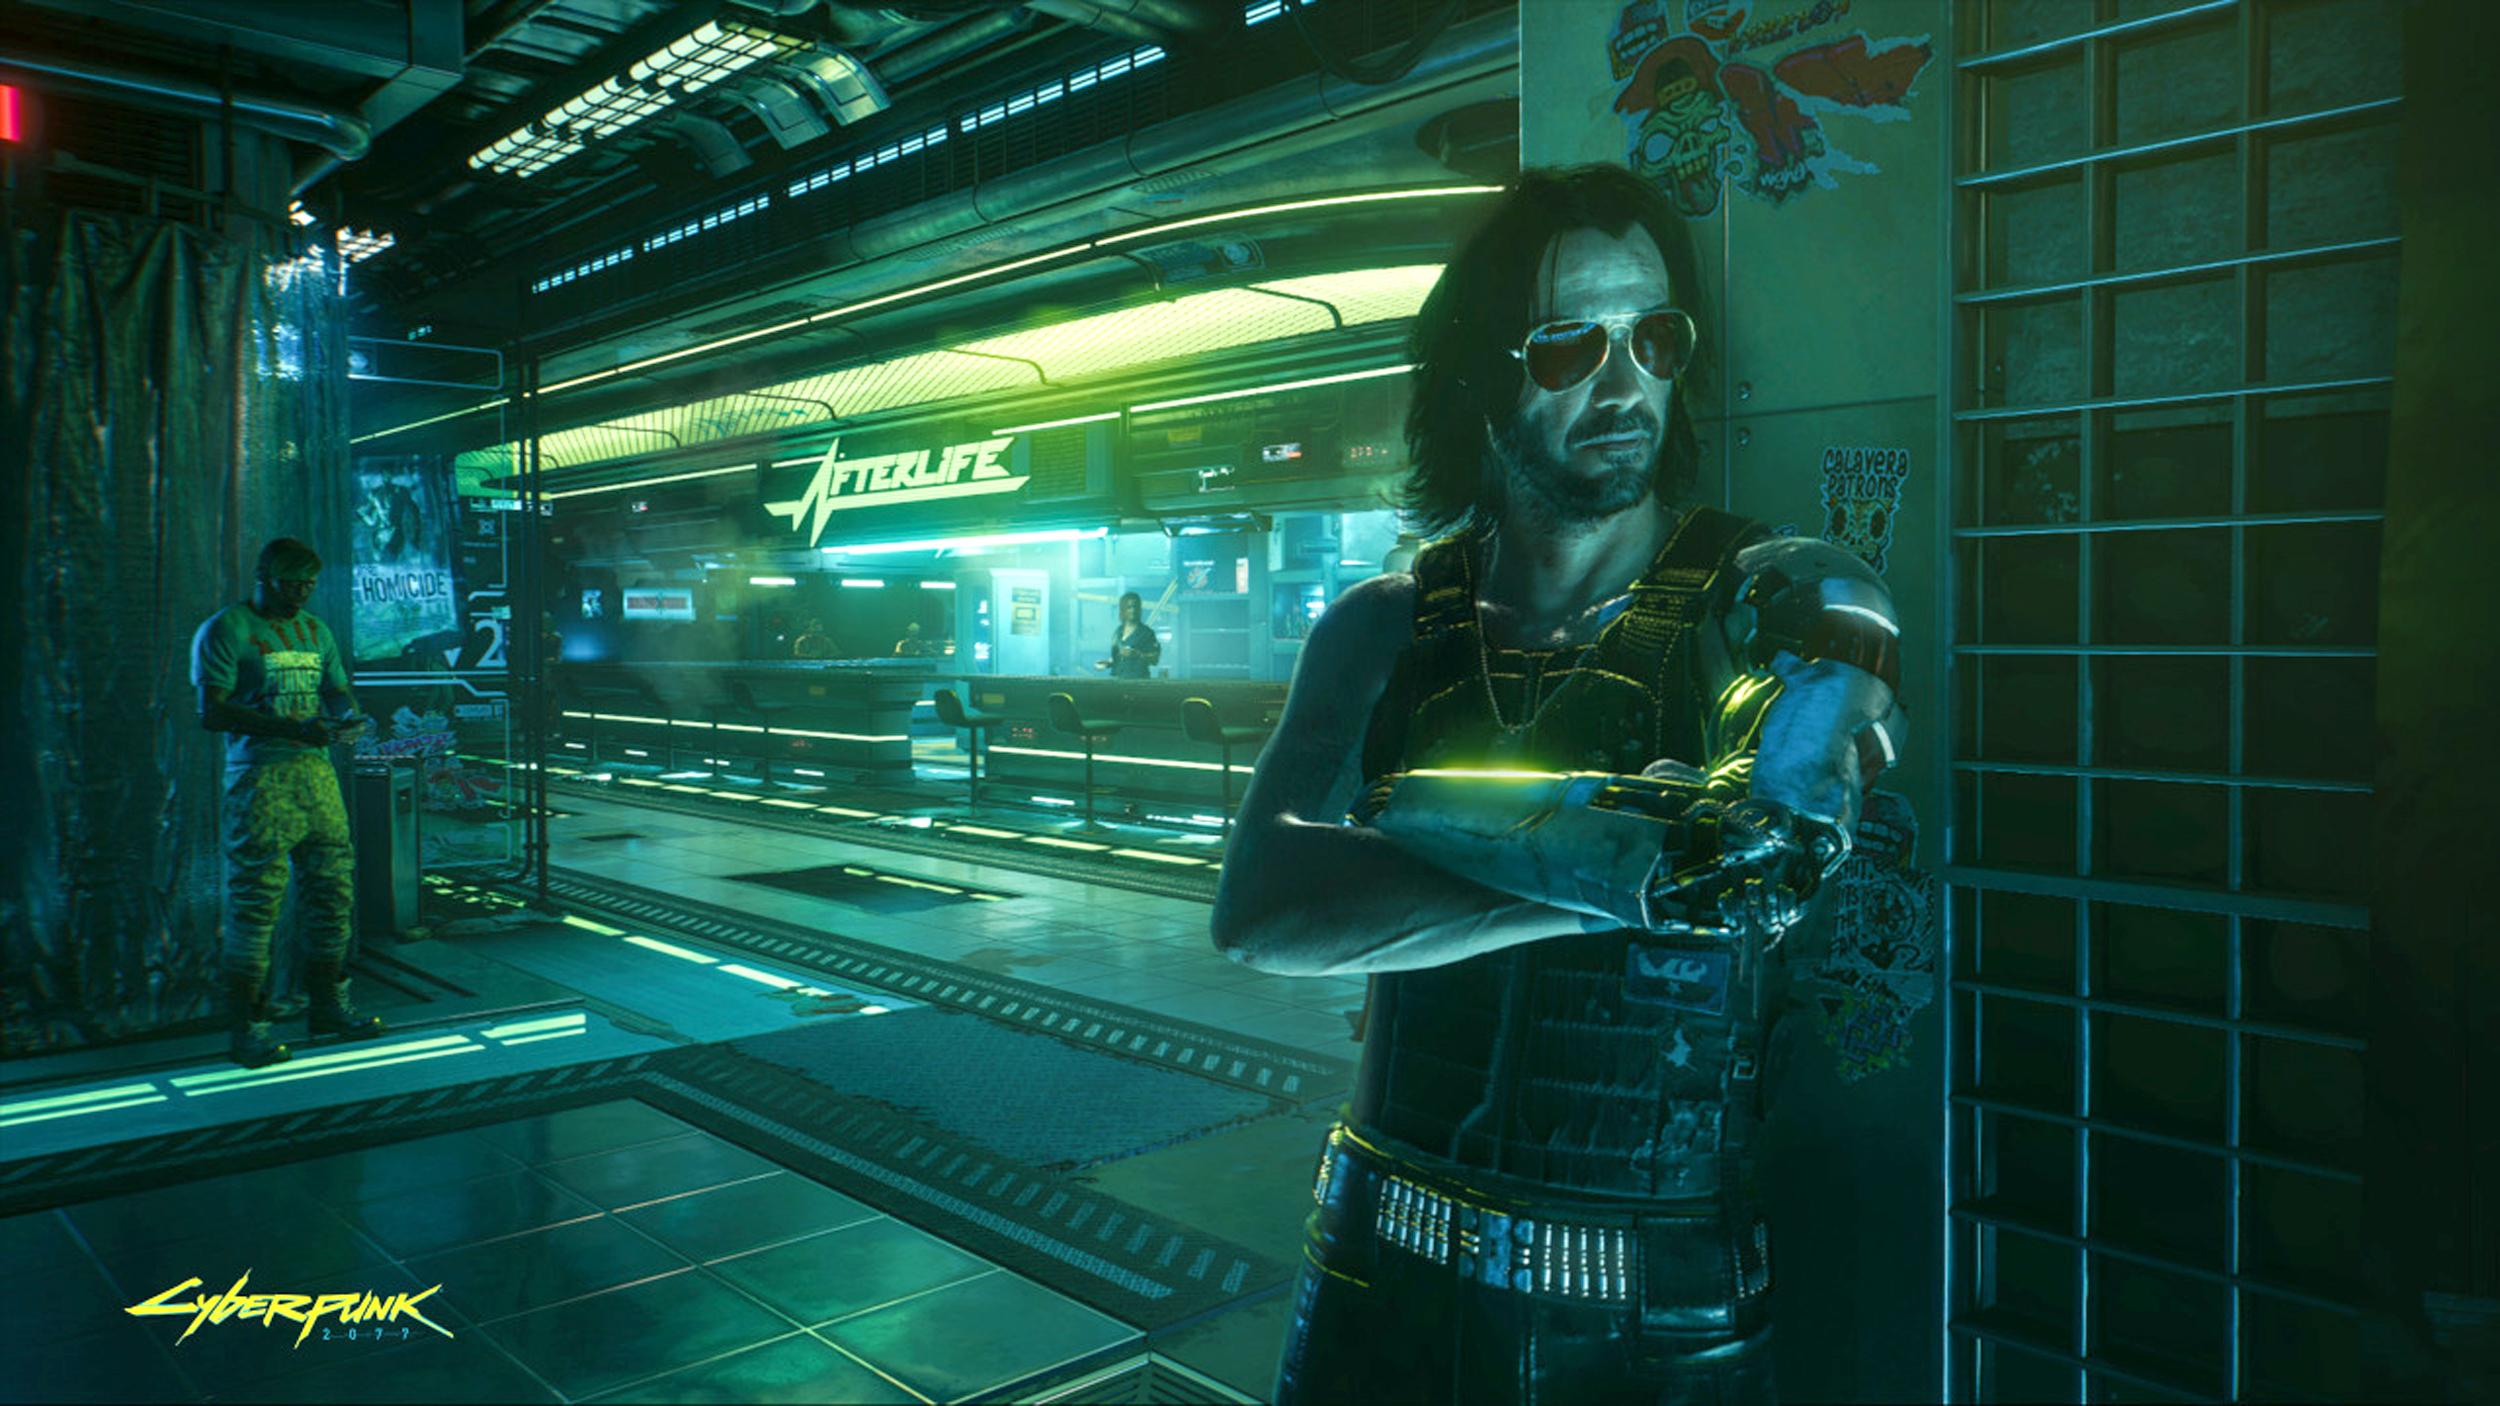 Cyberpunk 2077 hackers leilão